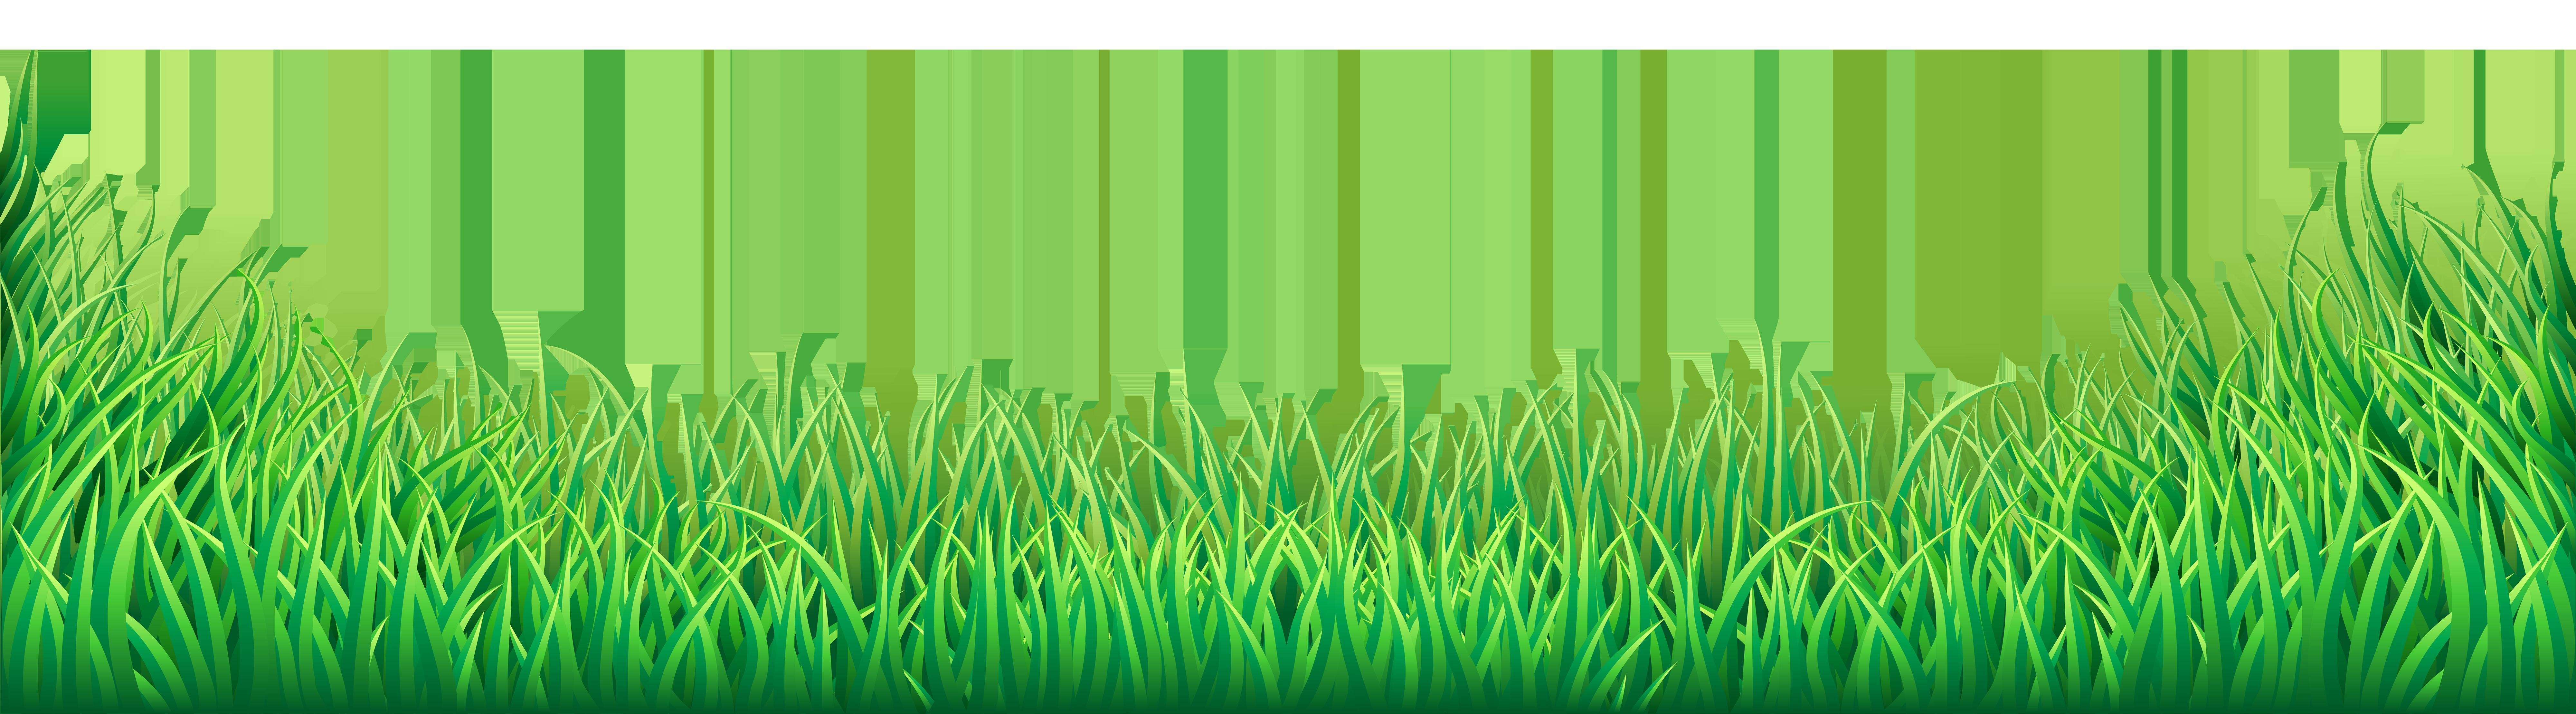 grass png transparent clip ar